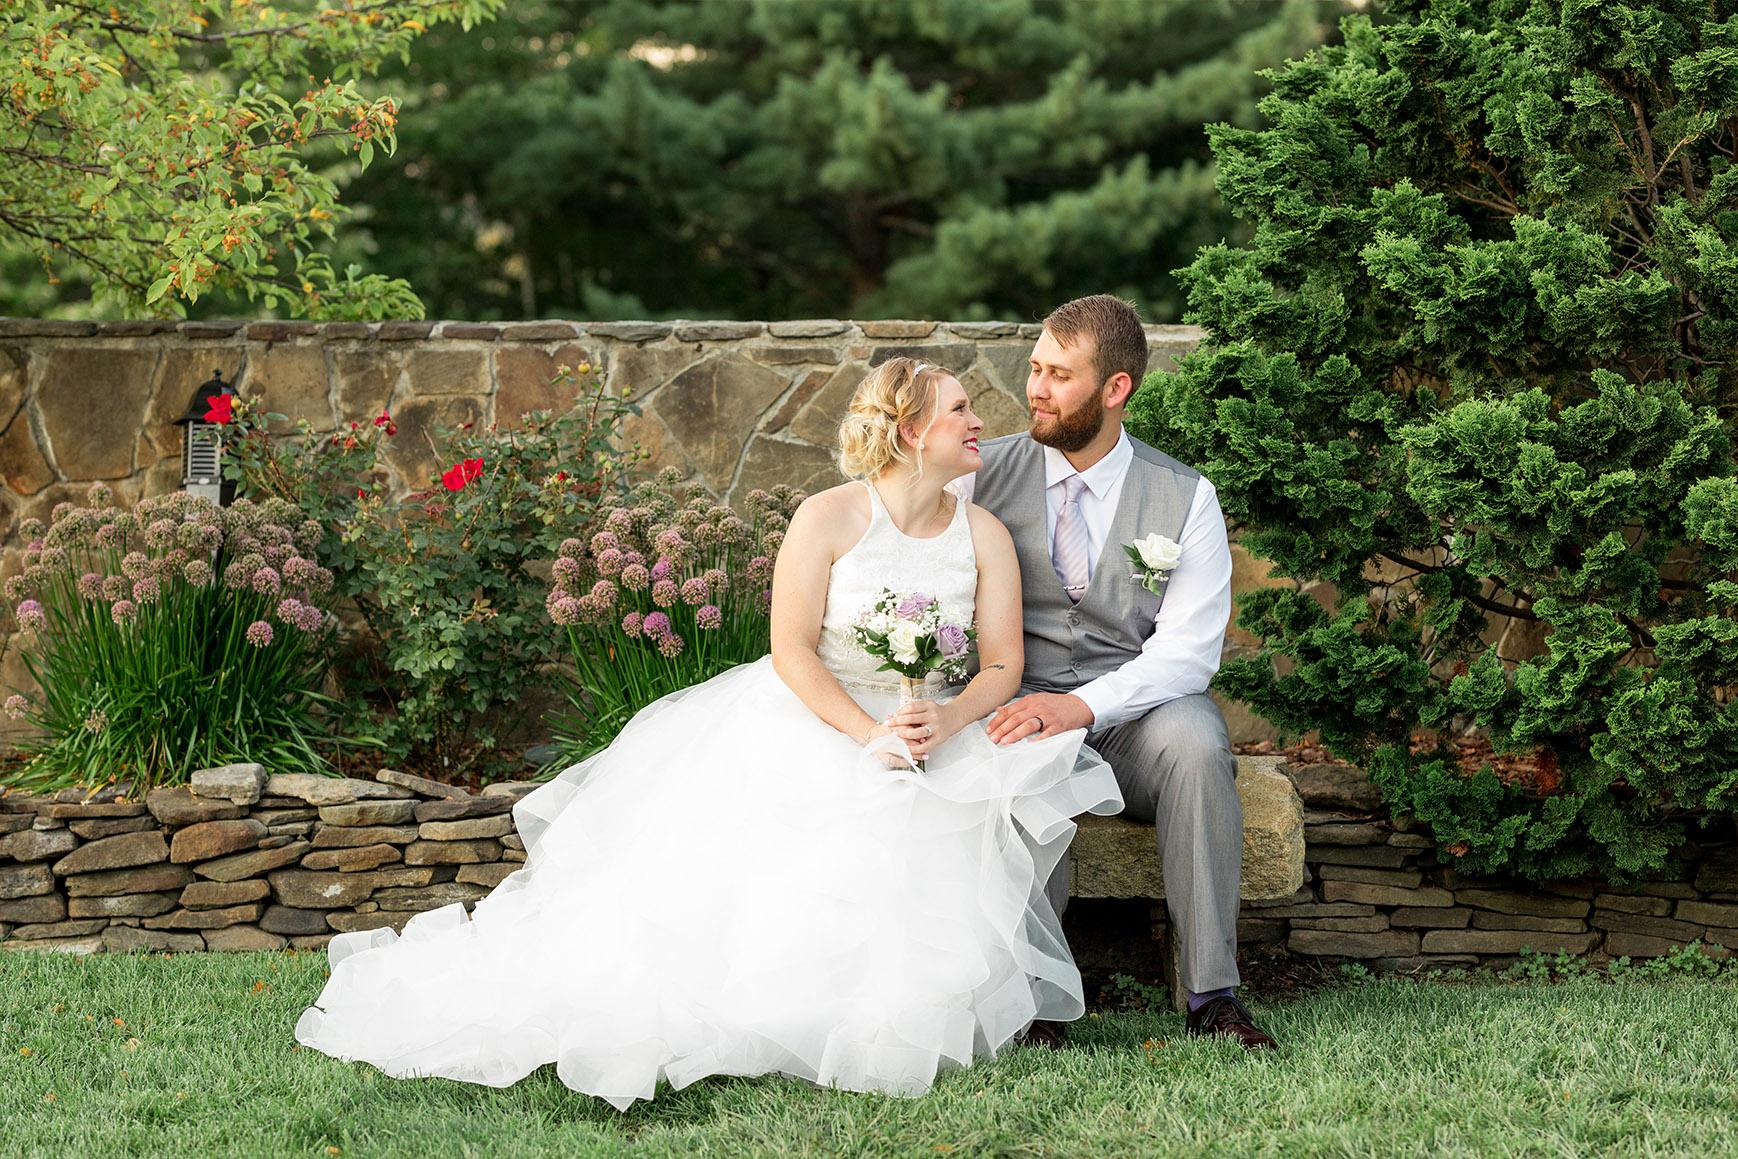 Happy Couple - Granite Rose - Hampstead, New Hampshire - Rockingham County - Wedgewood Weddings